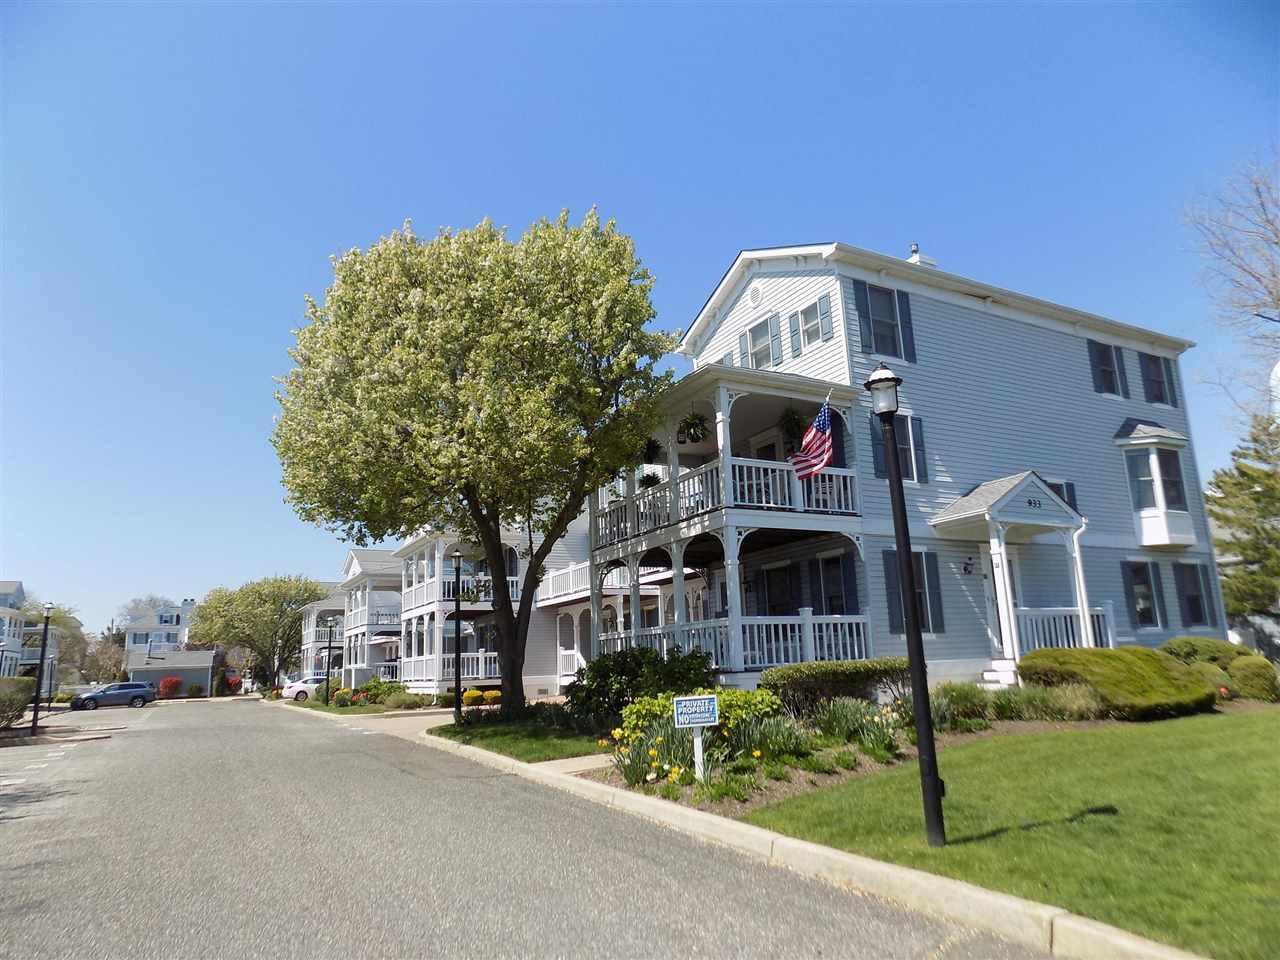 933 Columbia Avenue - Cape May